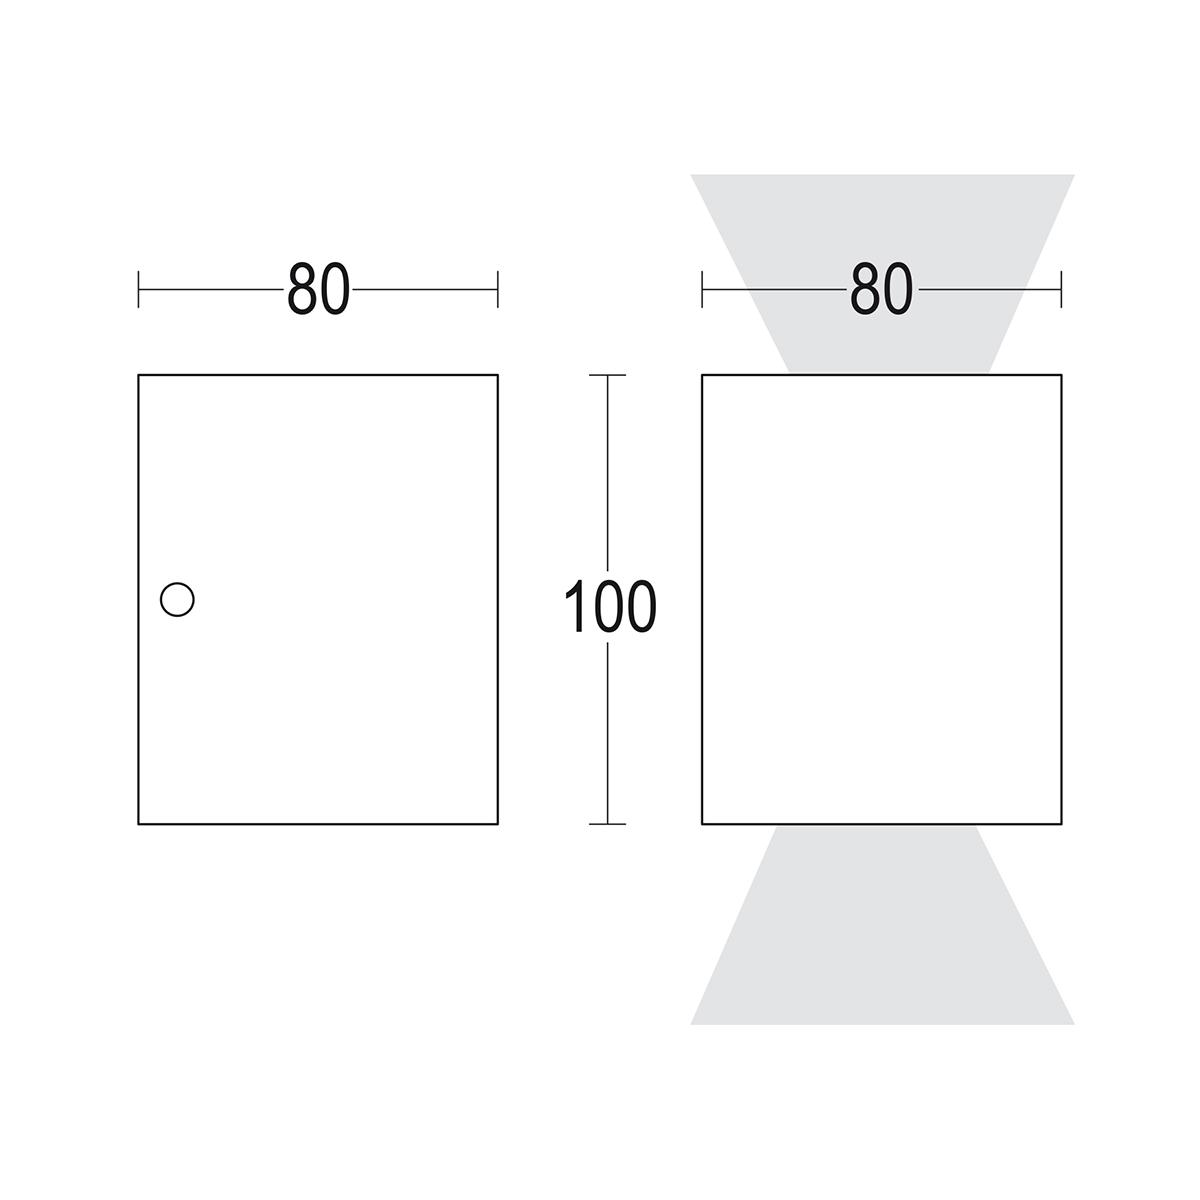 чертеж Compatto 2L 80x100 Ghidini уличный светильник GH1144.BRST300EN